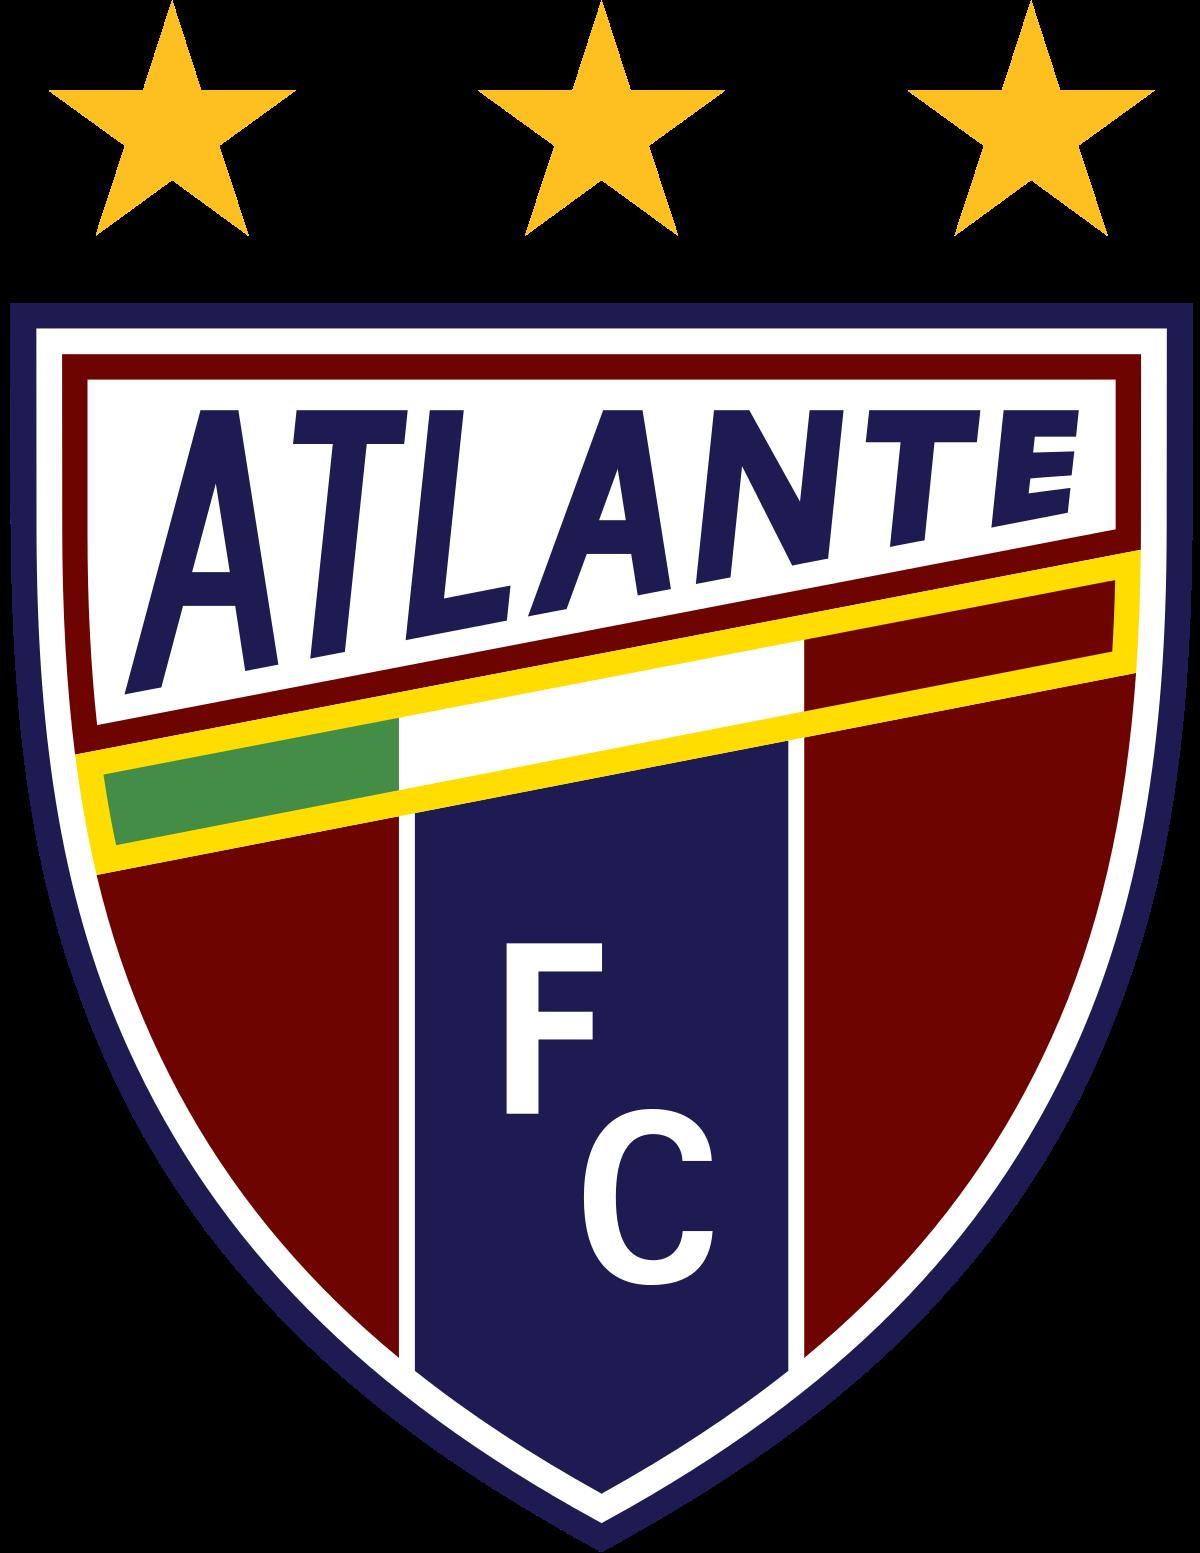 Atlante F C Wikipedia Football Team Logos Football Logo Team Badge